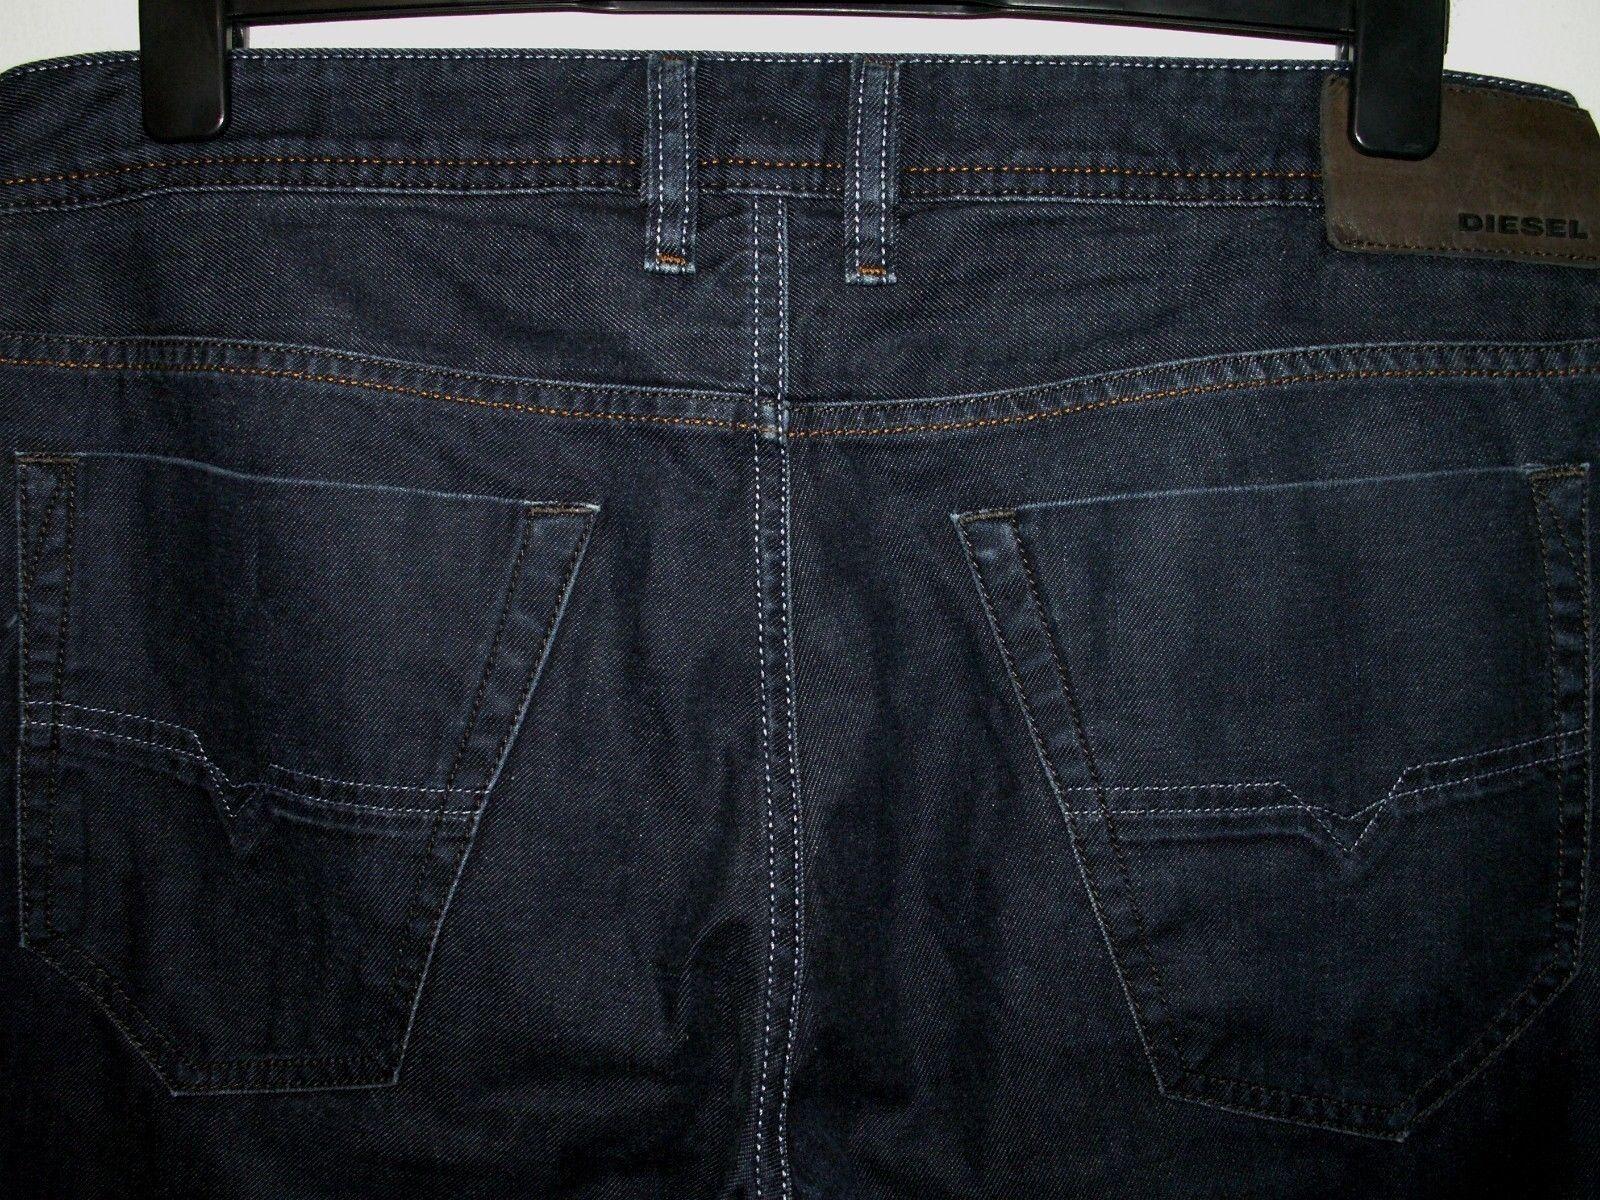 Diesel koolter regular slim-tapered fit jeans wash 0661D W33 L32 (a4320)